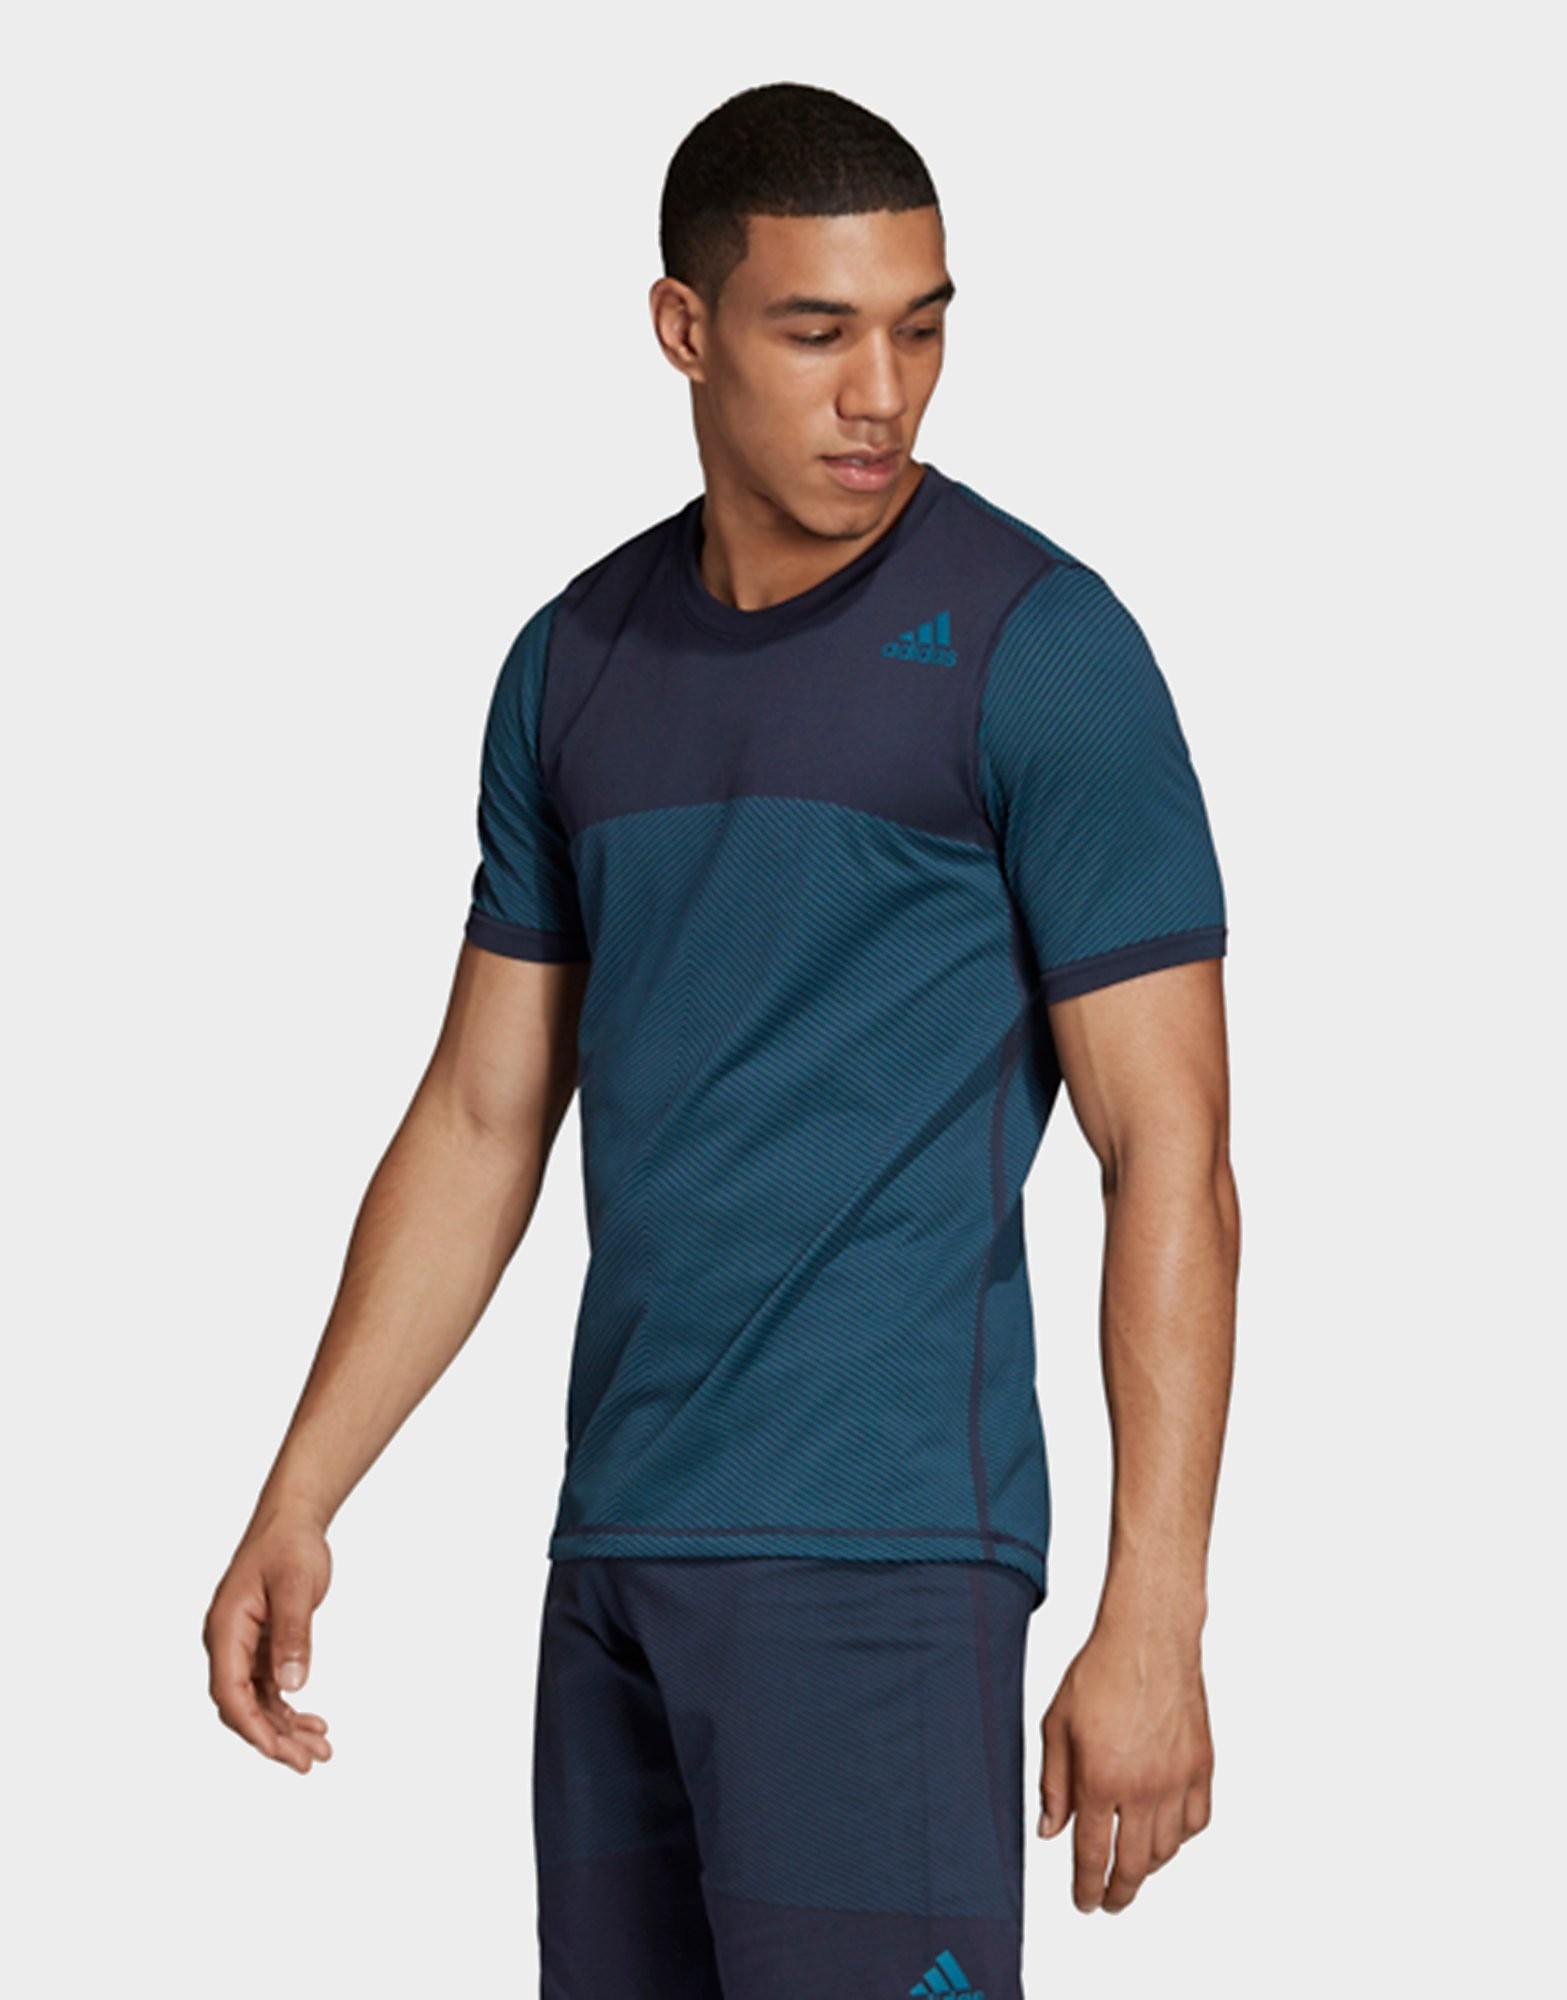 Adidas t shirts & giubbotto uomini jd sports